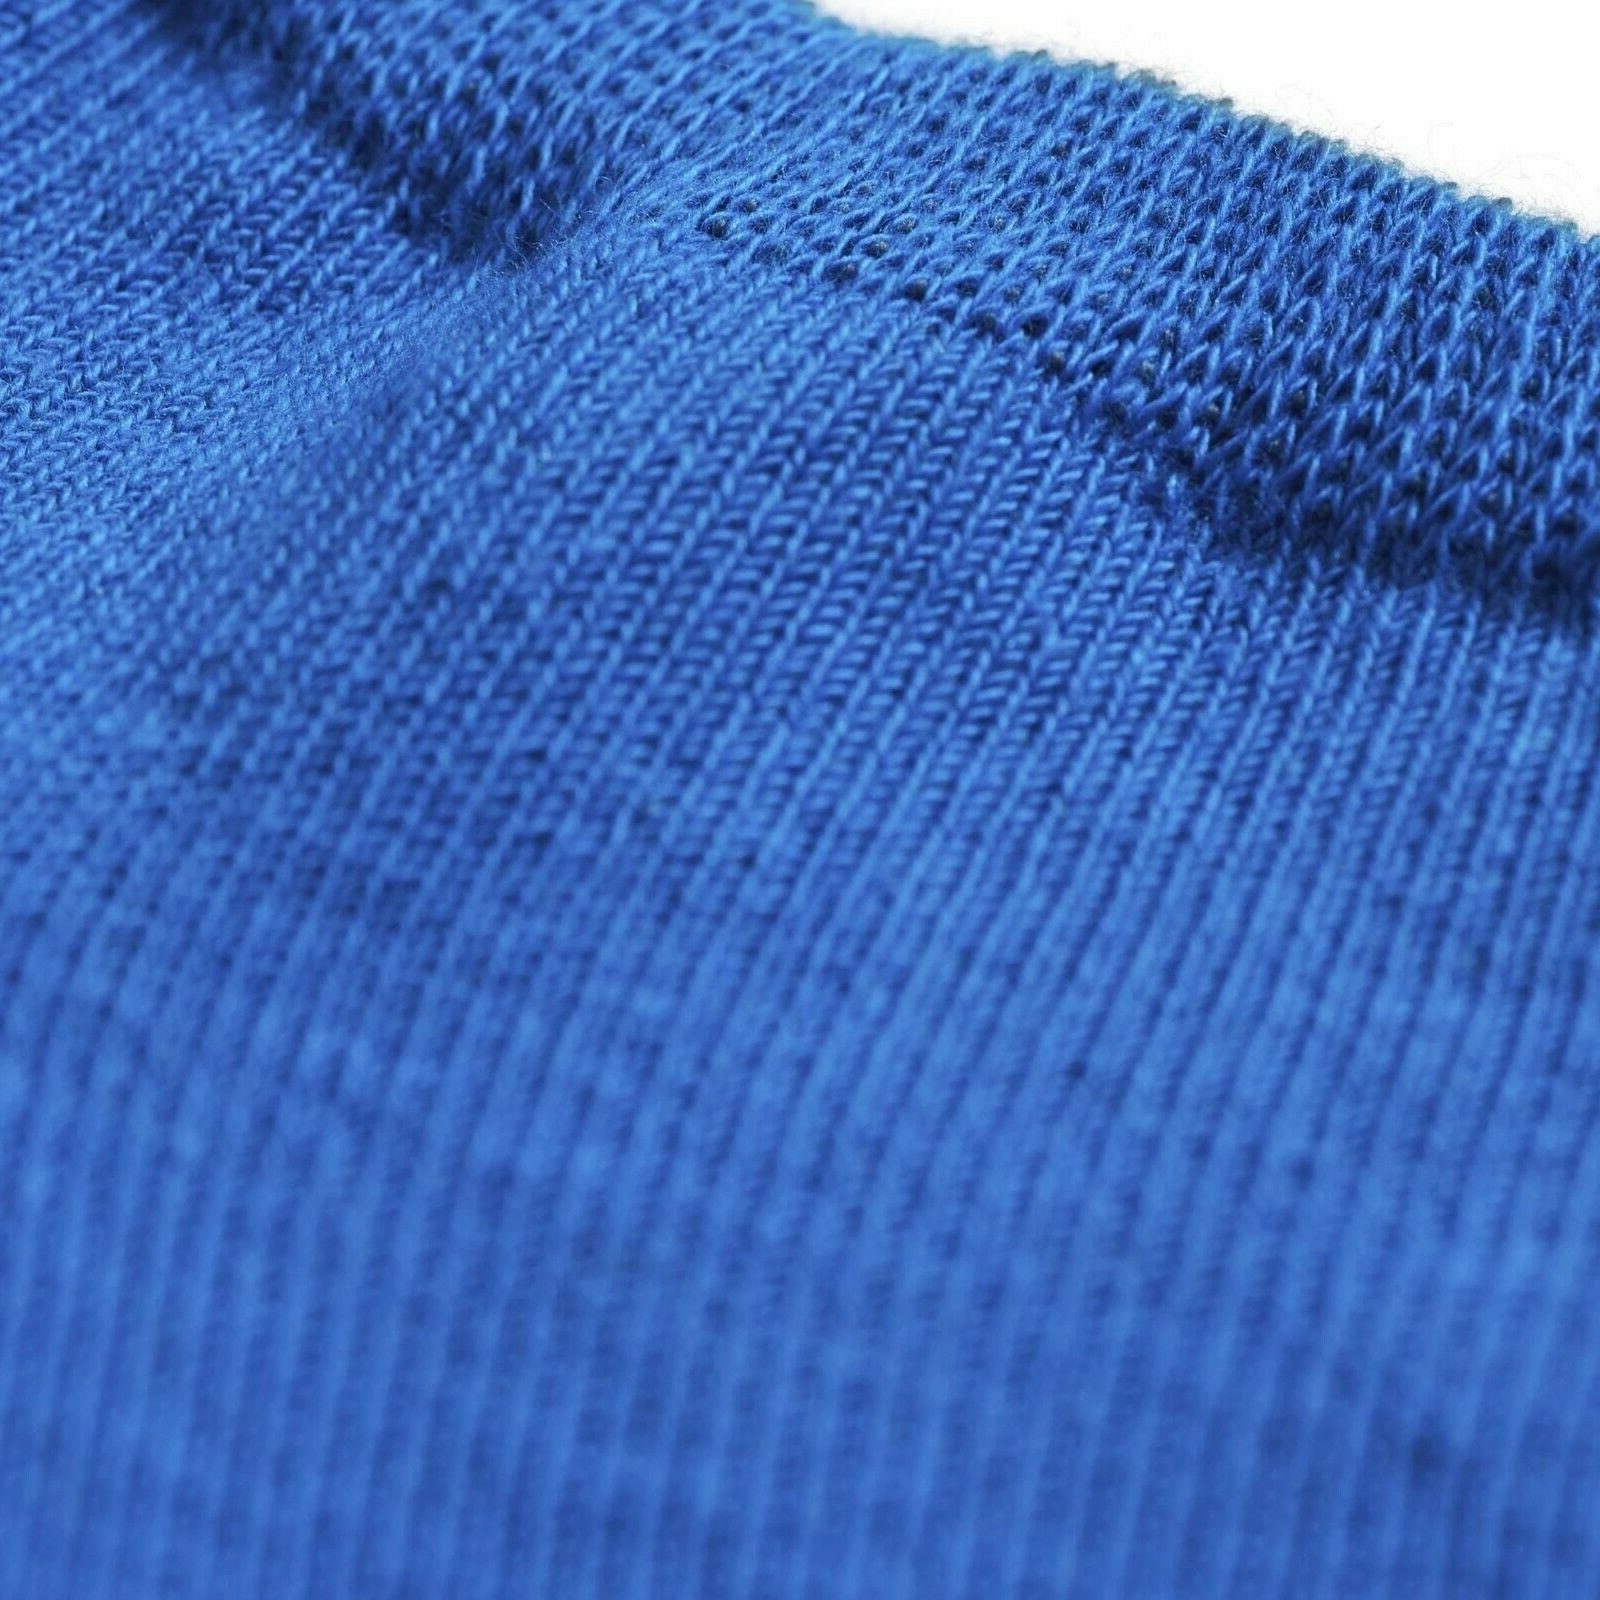 adidas Unisex Trefoil Black Grey Blue White 3 S20275